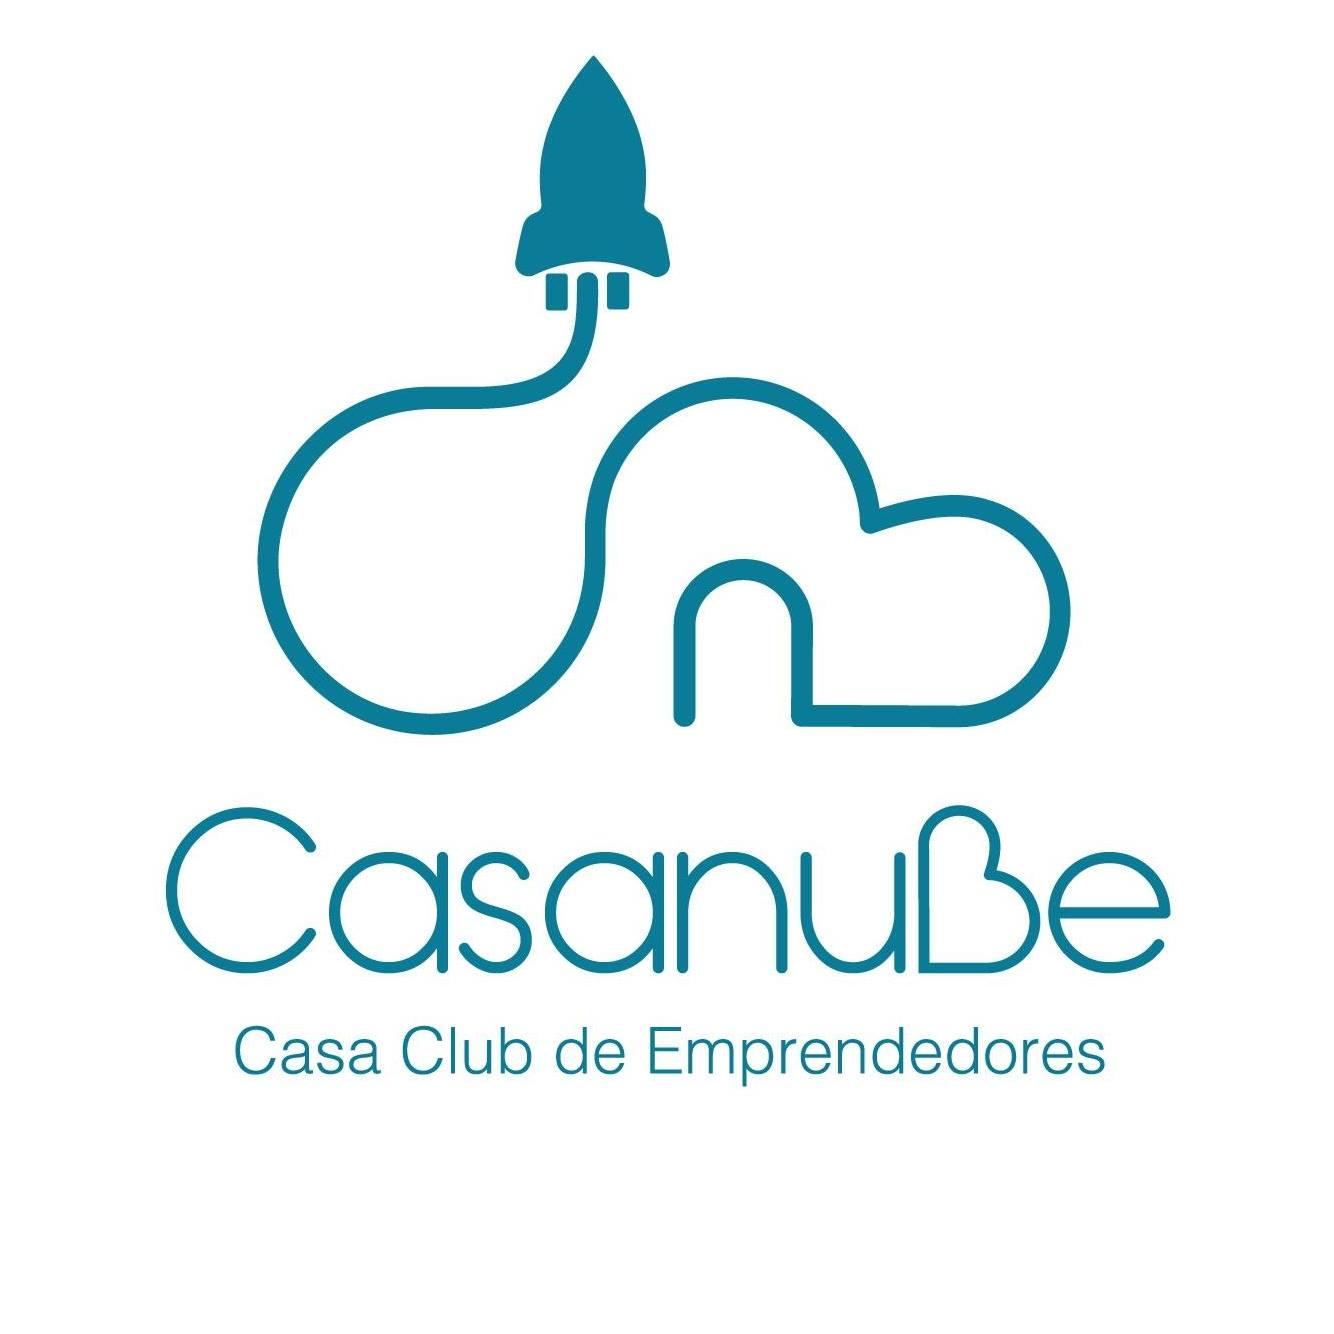 Casanube